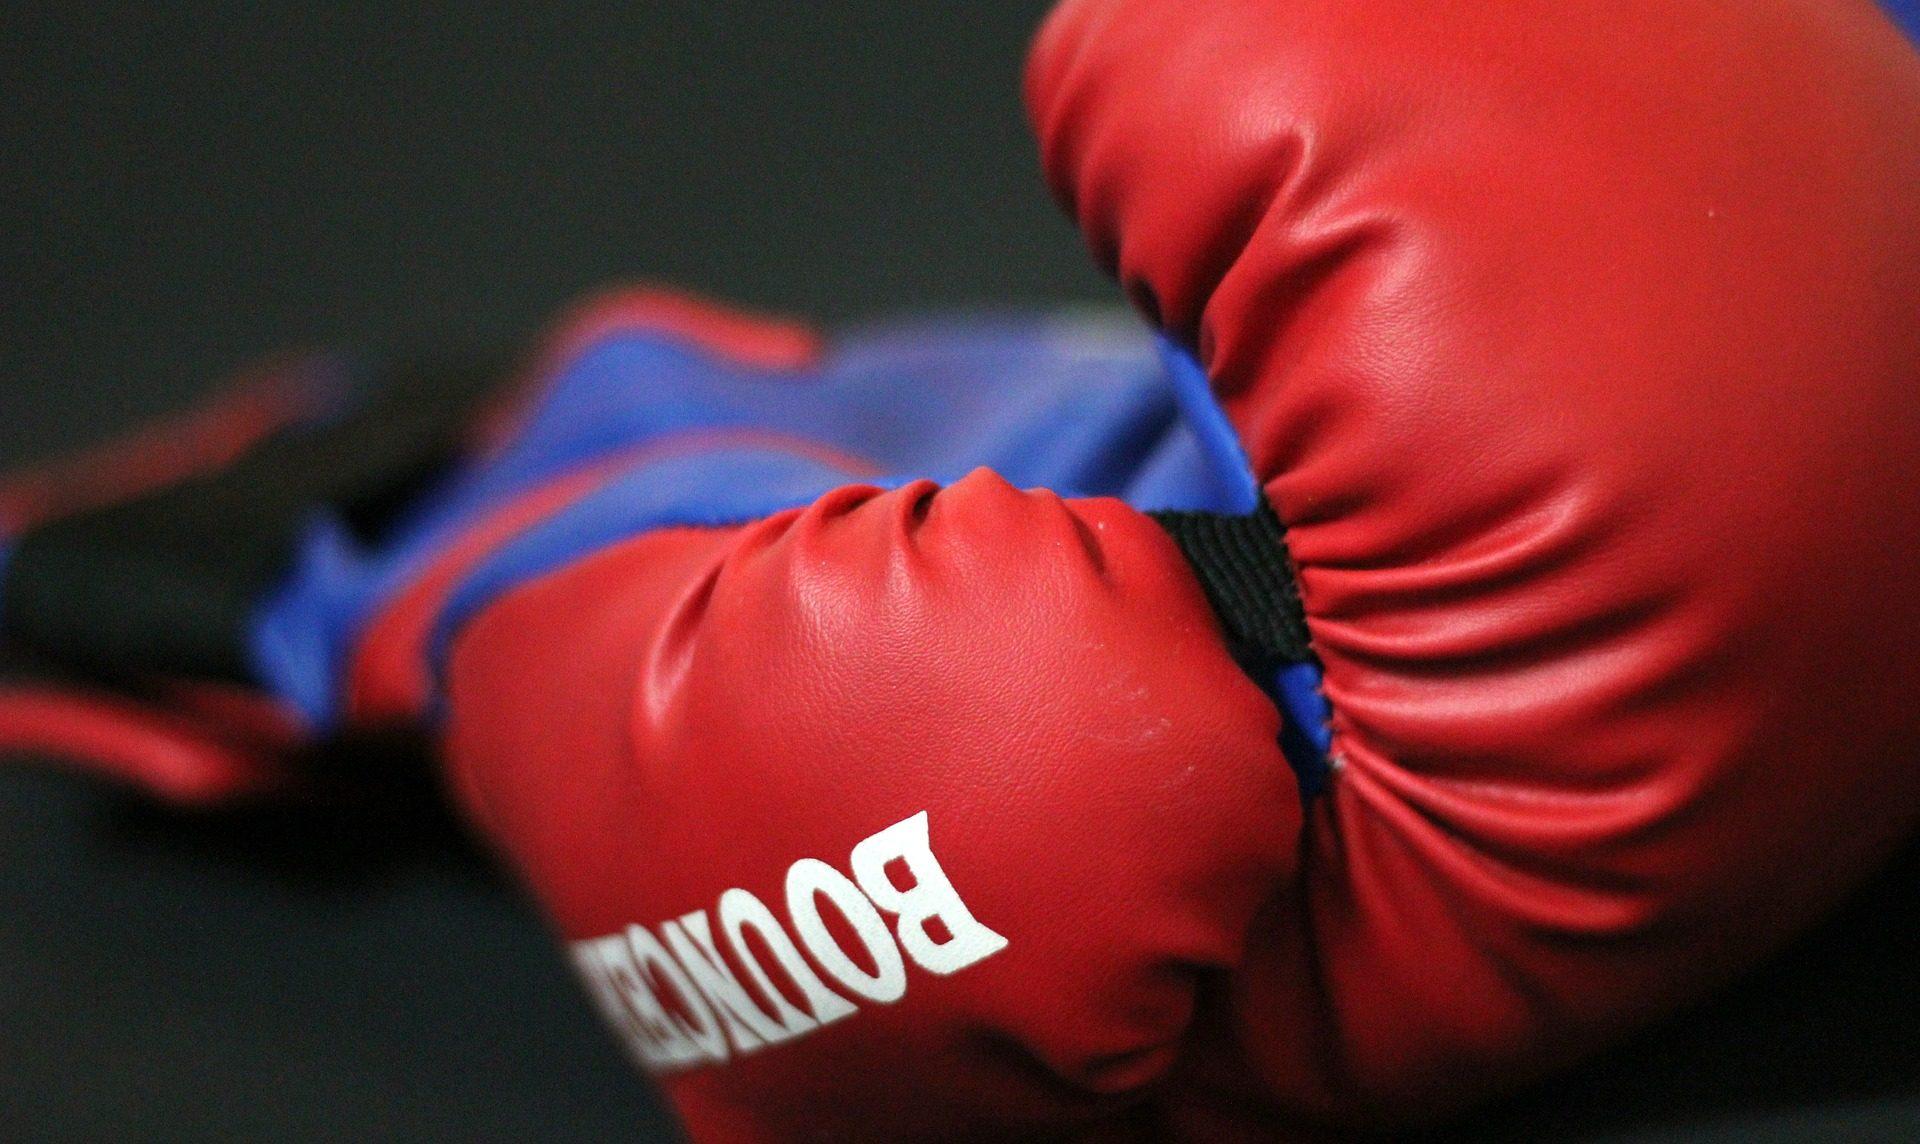 luvas, Boxe, luta, artes marciais, concorrência - Papéis de parede HD - Professor-falken.com